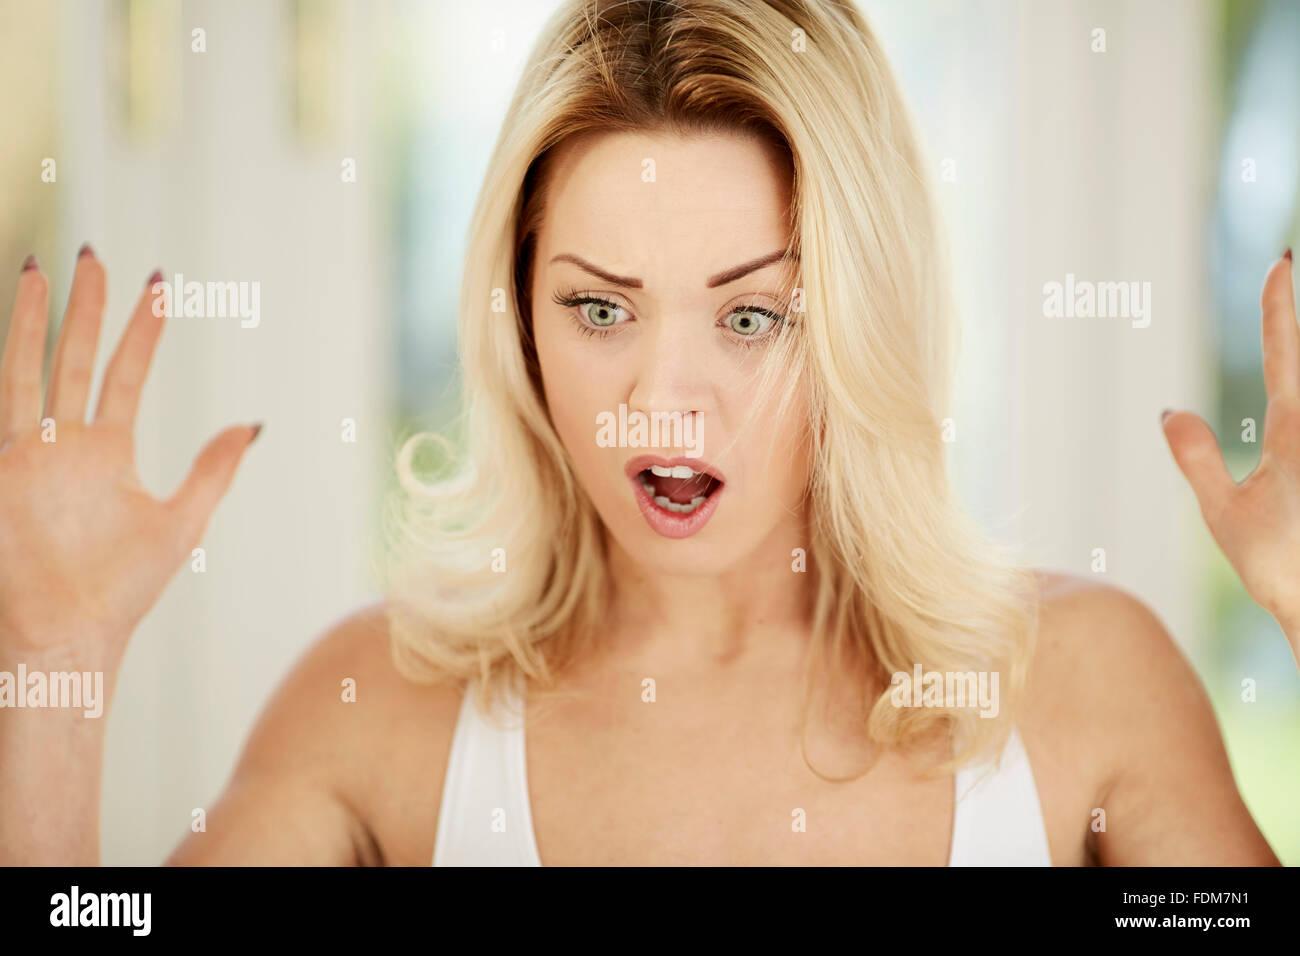 Shocked woman - Stock Image